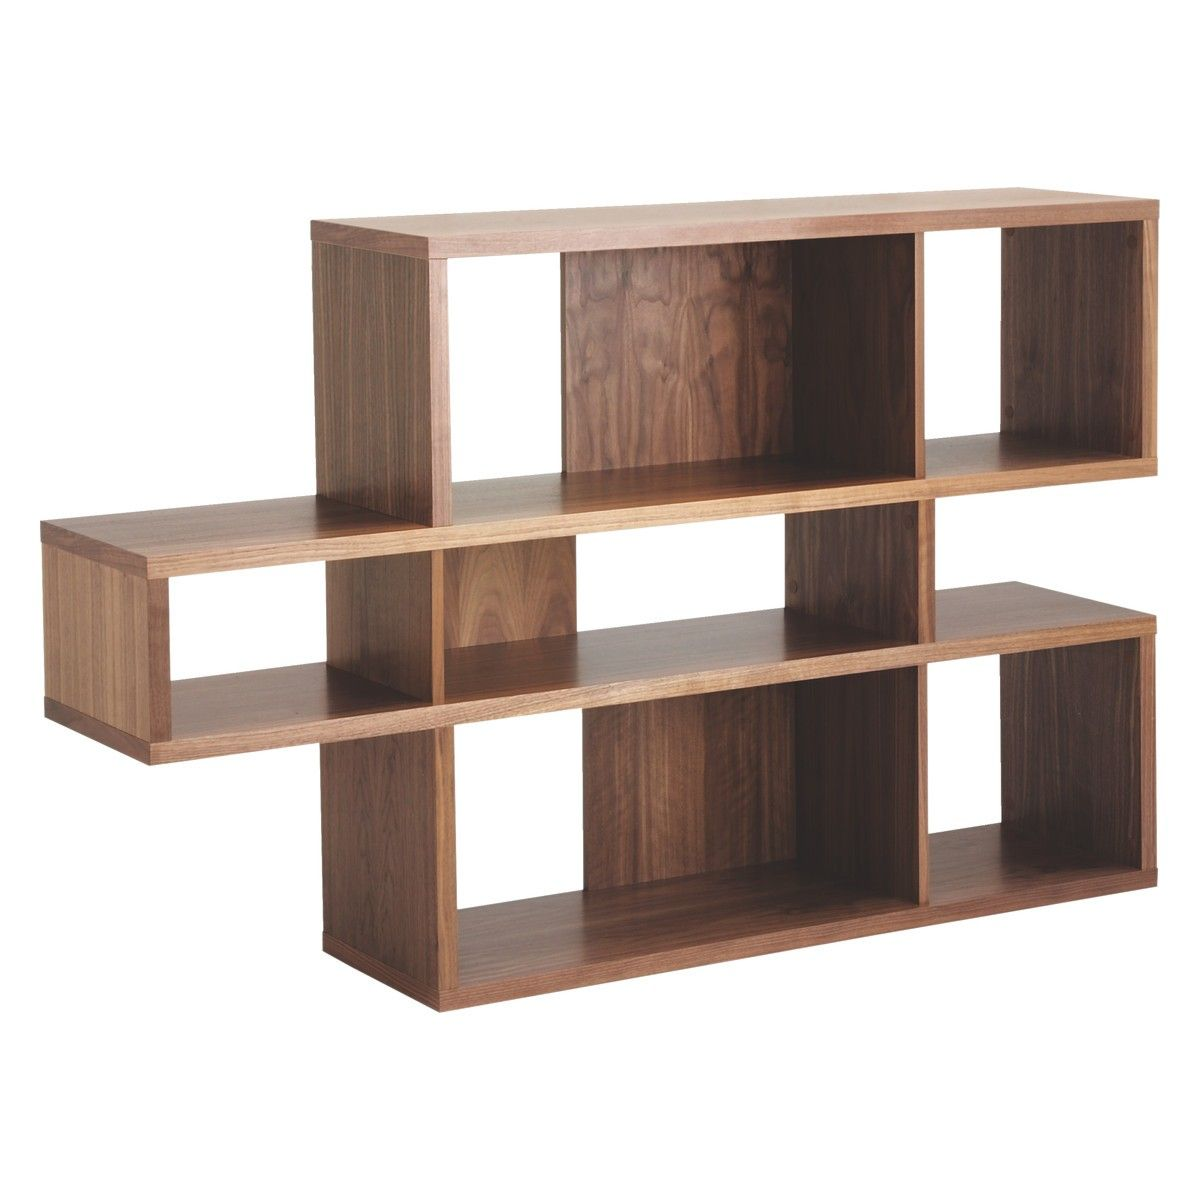 sports shoes 85624 943c5 ANTONN Low walnut veneer shelving unit | bookshelves ...